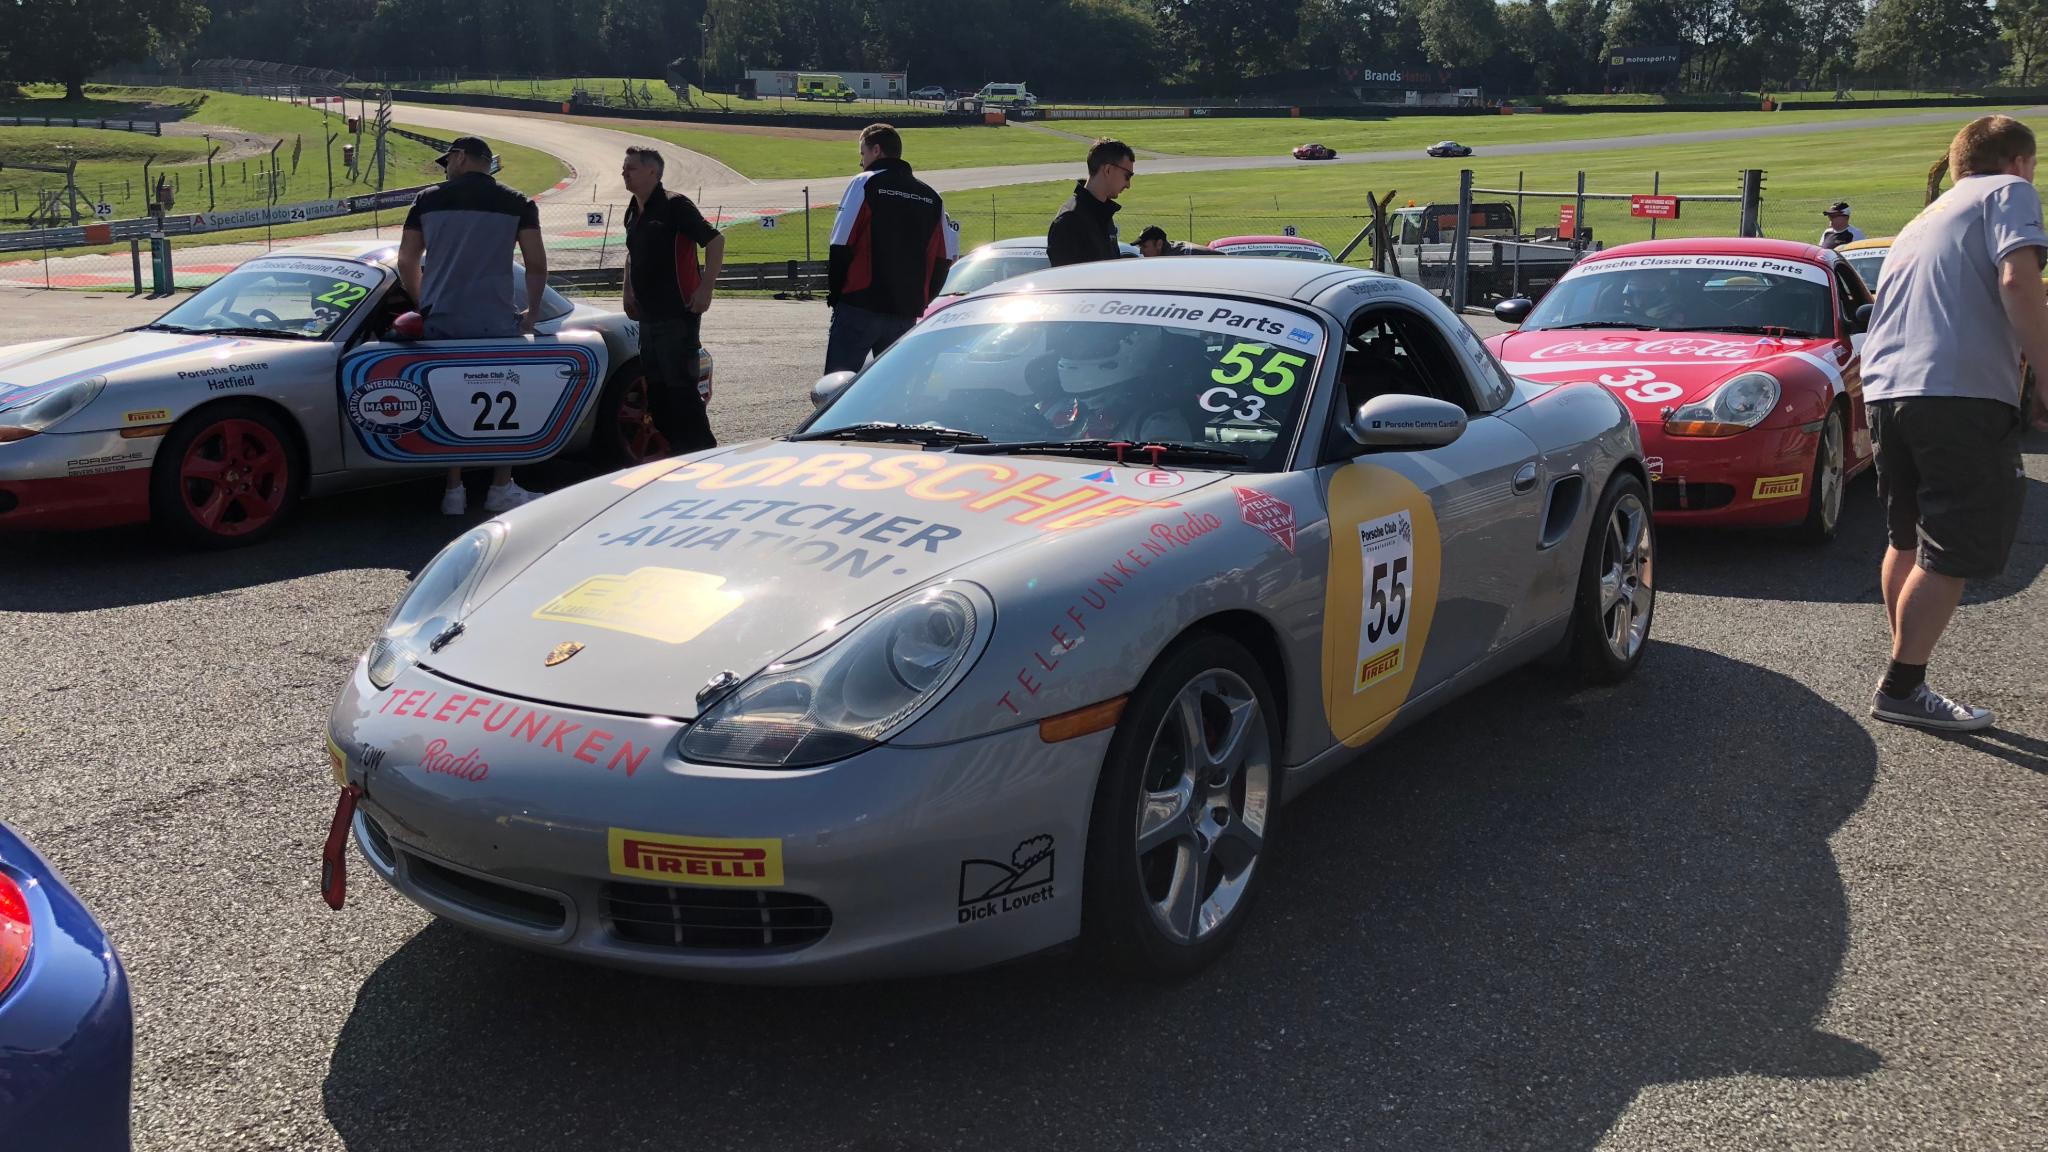 Porsche Centre Cardiff (1)